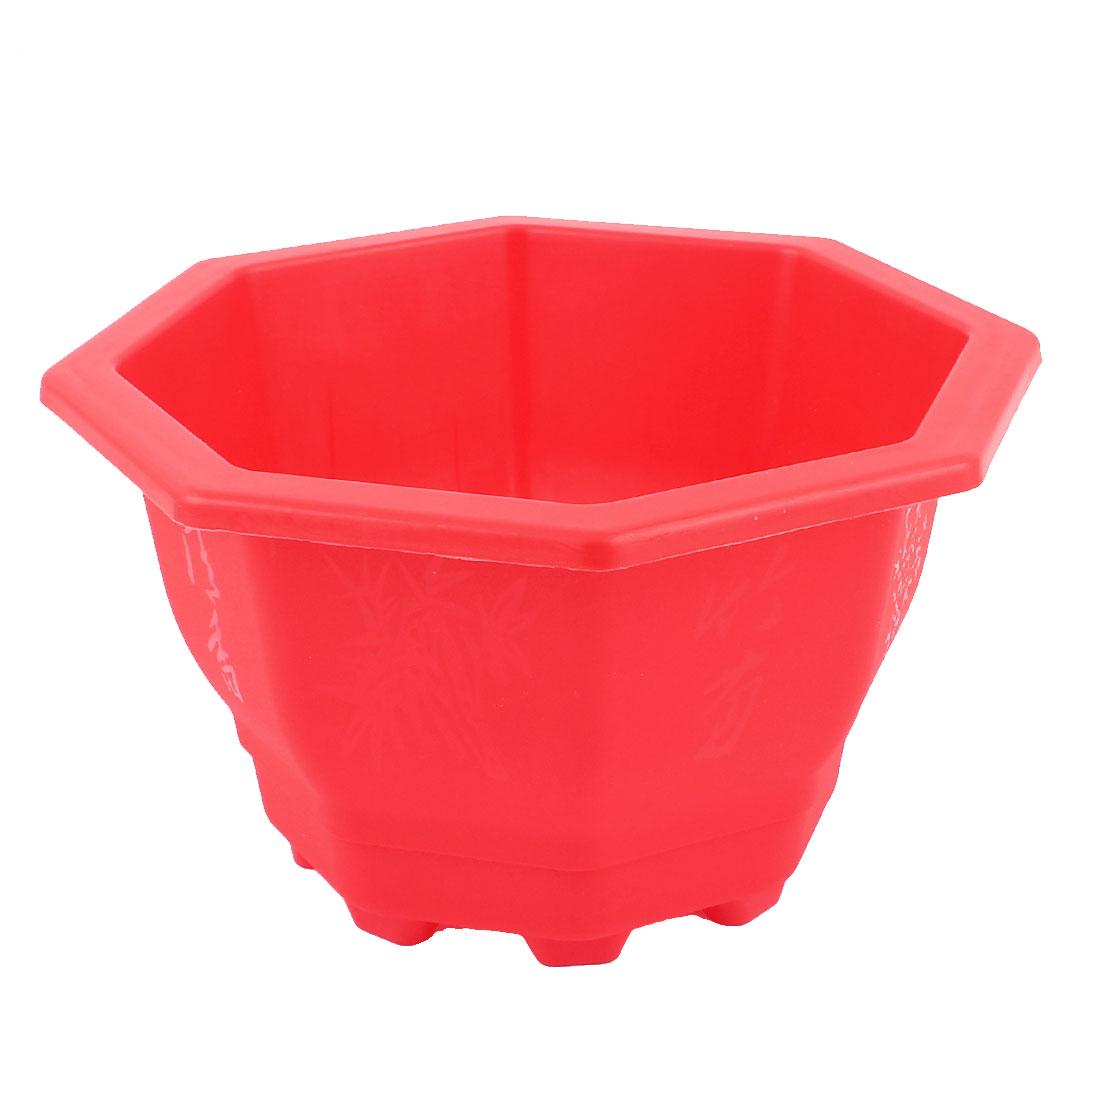 Red Plastic Octagon Design Garden Planter Plant Flower Pot Barrel Flowerpot